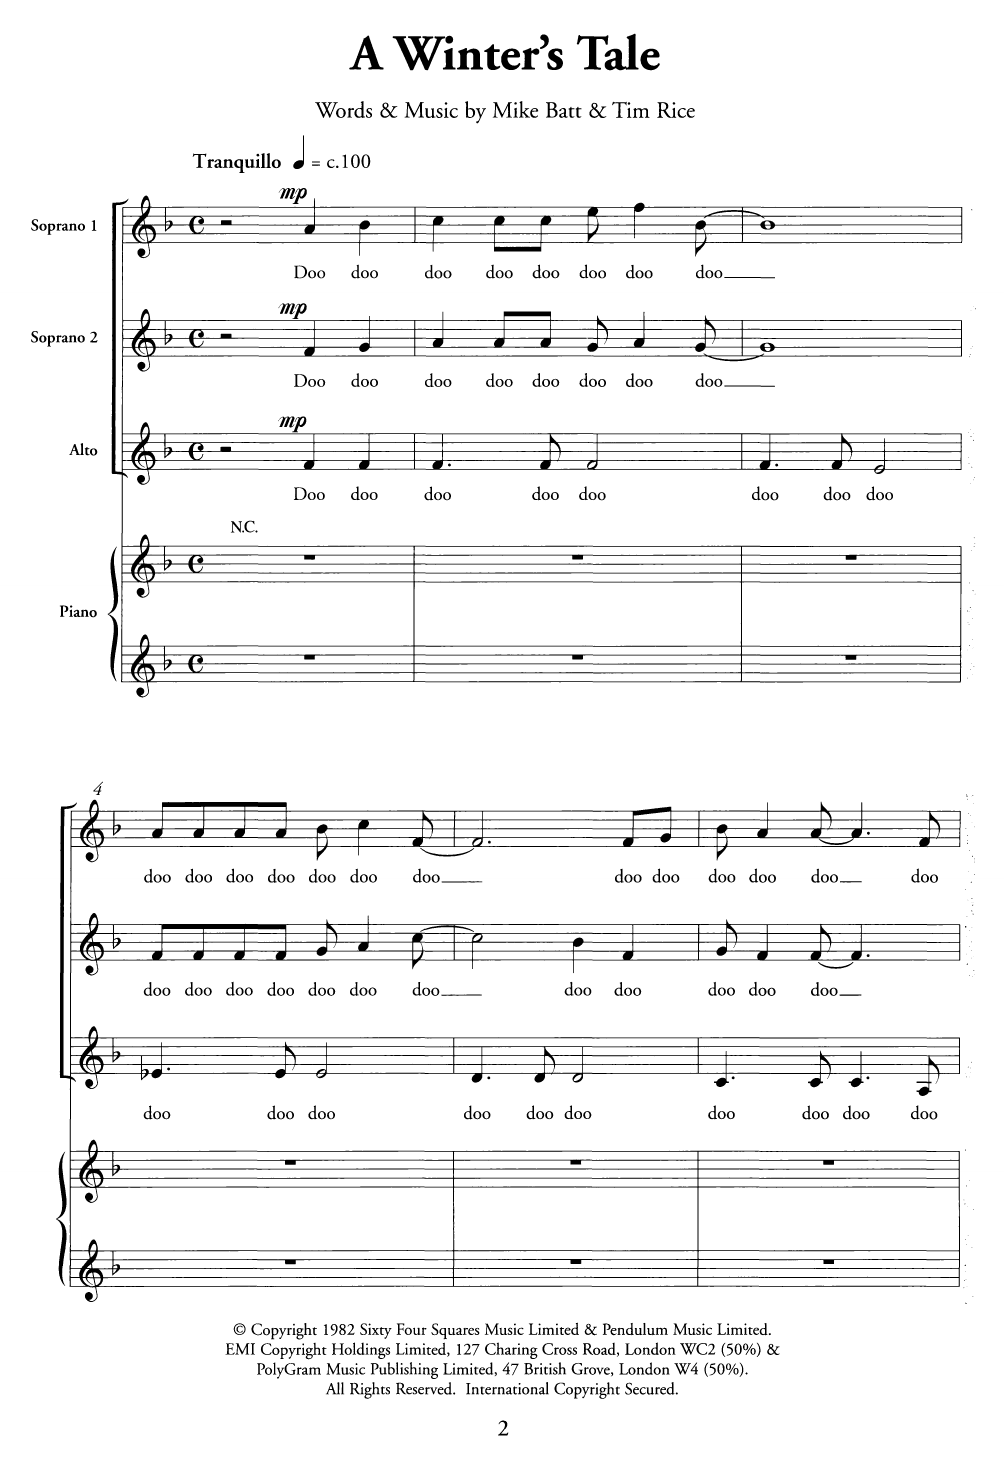 A Winter's Tale Sheet Music